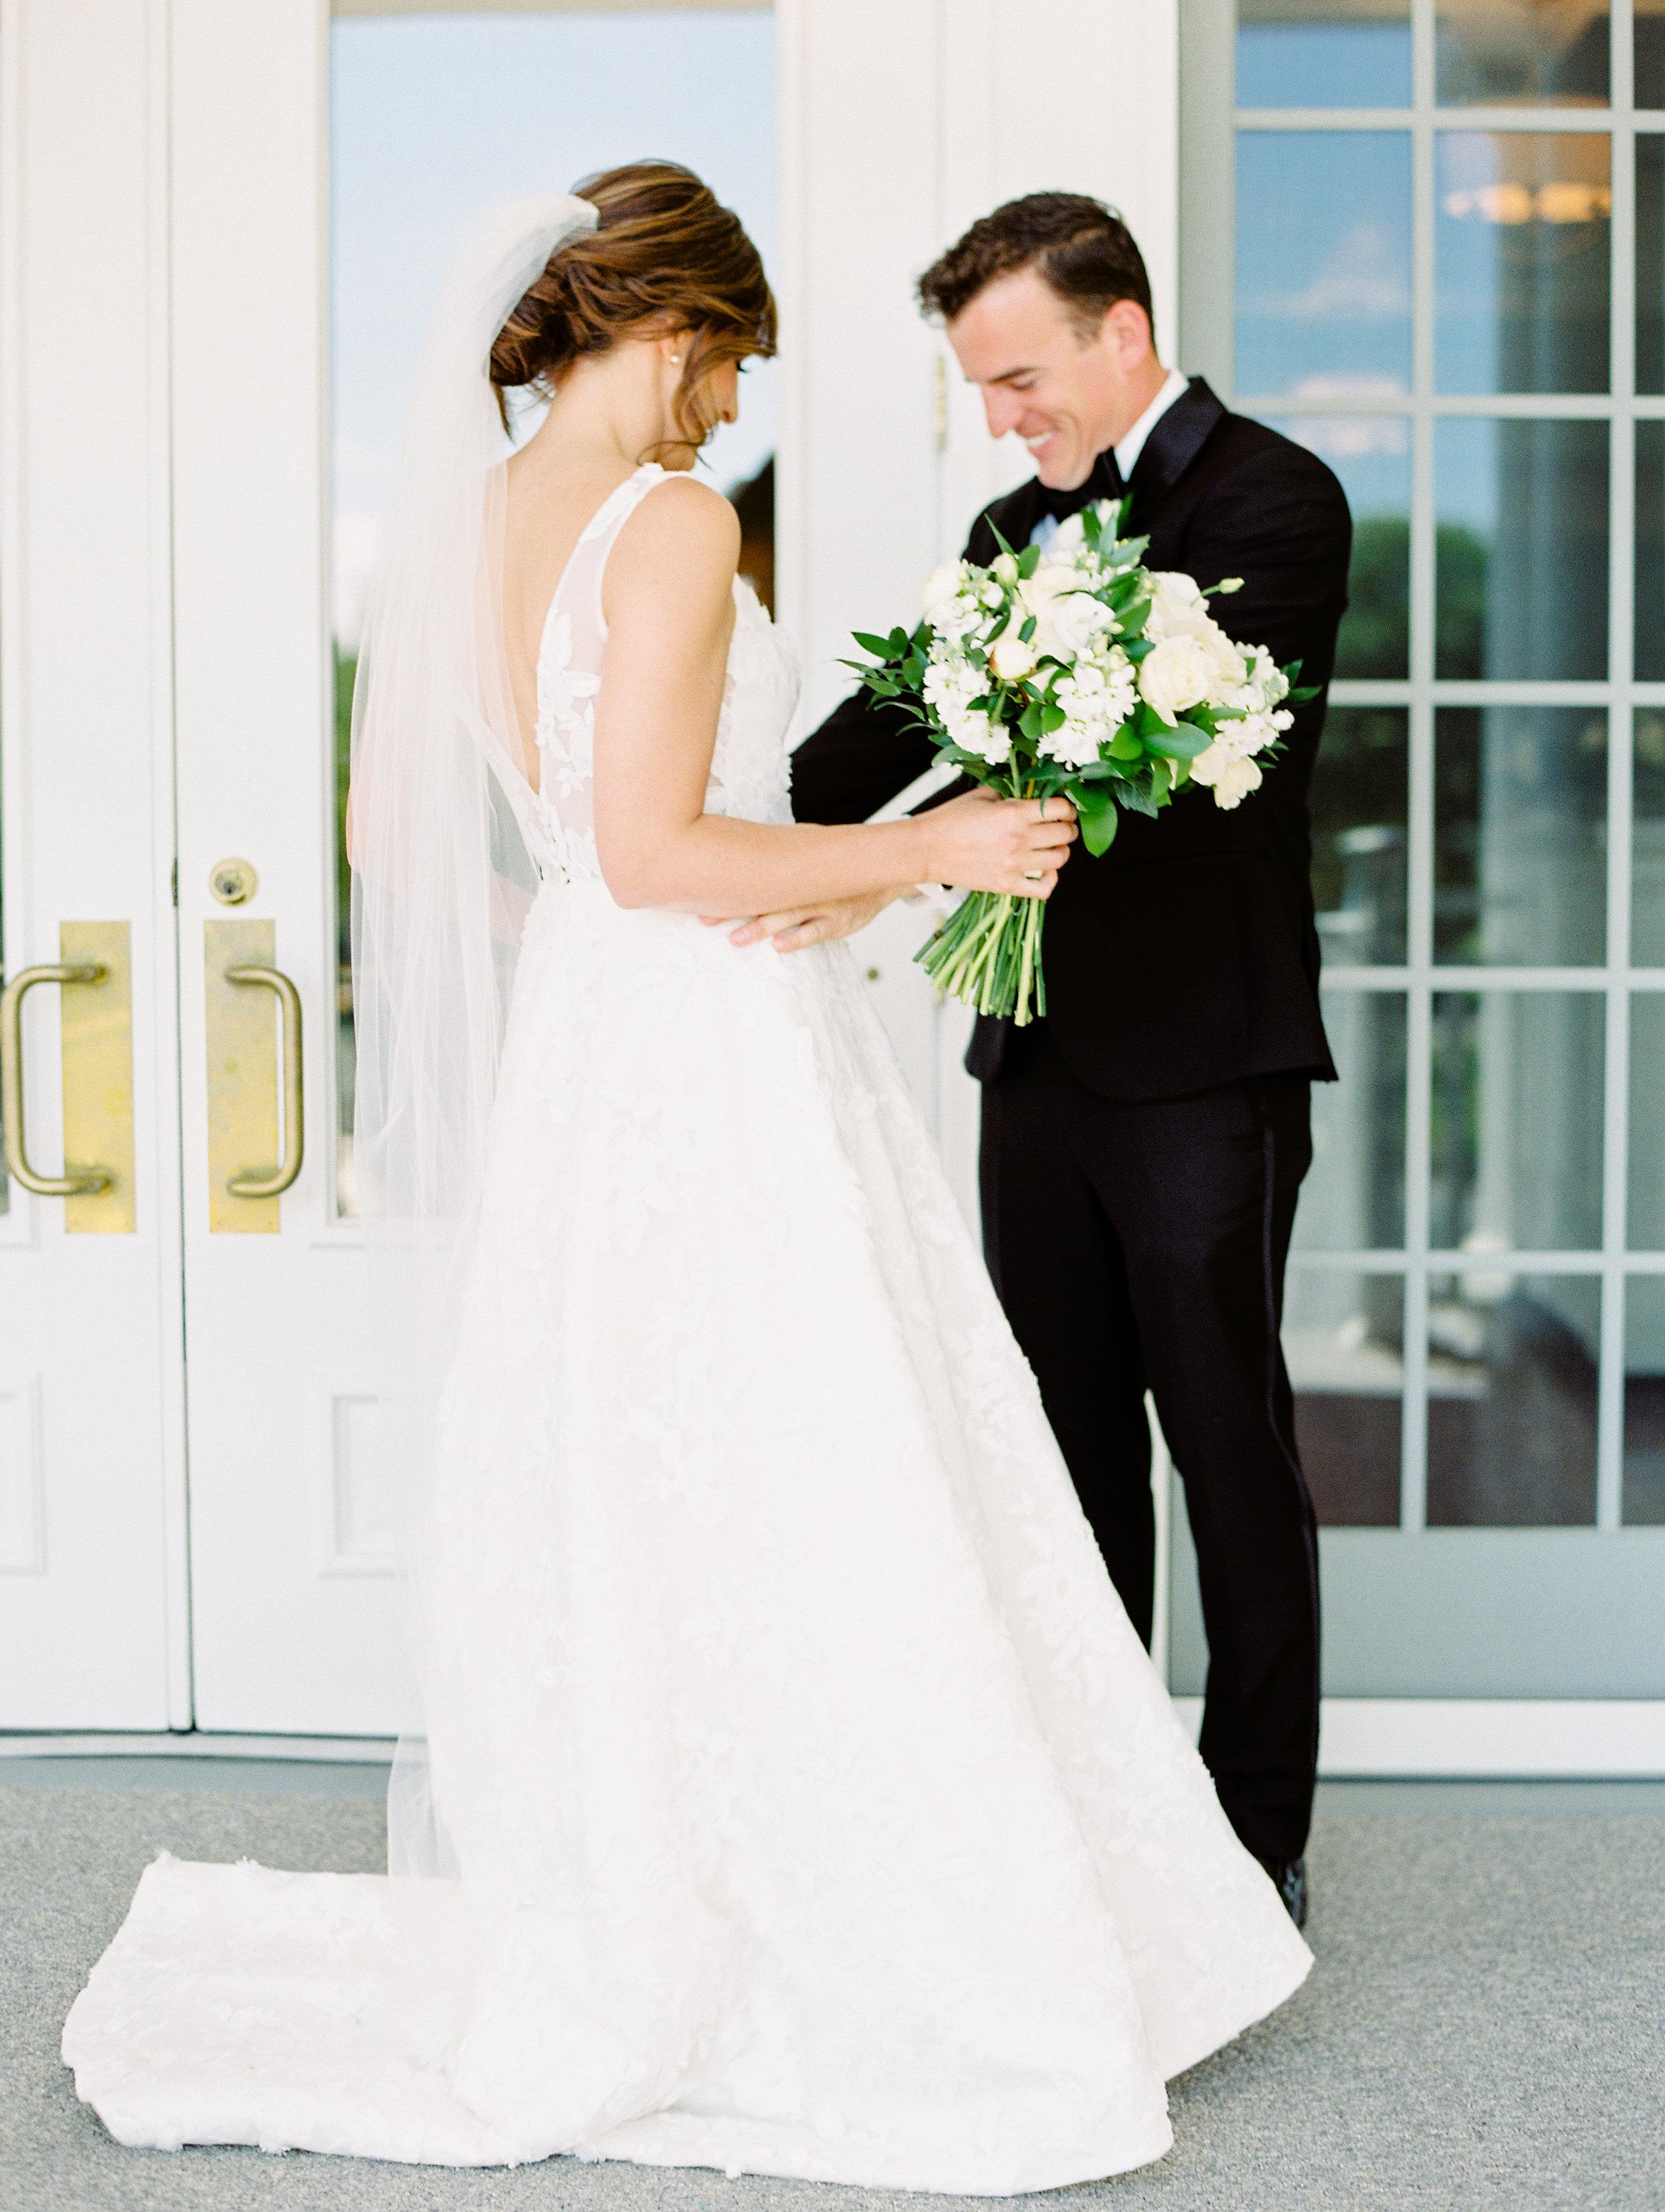 DeGuilio+Wedding+First+Lookf-5 copy.jpg